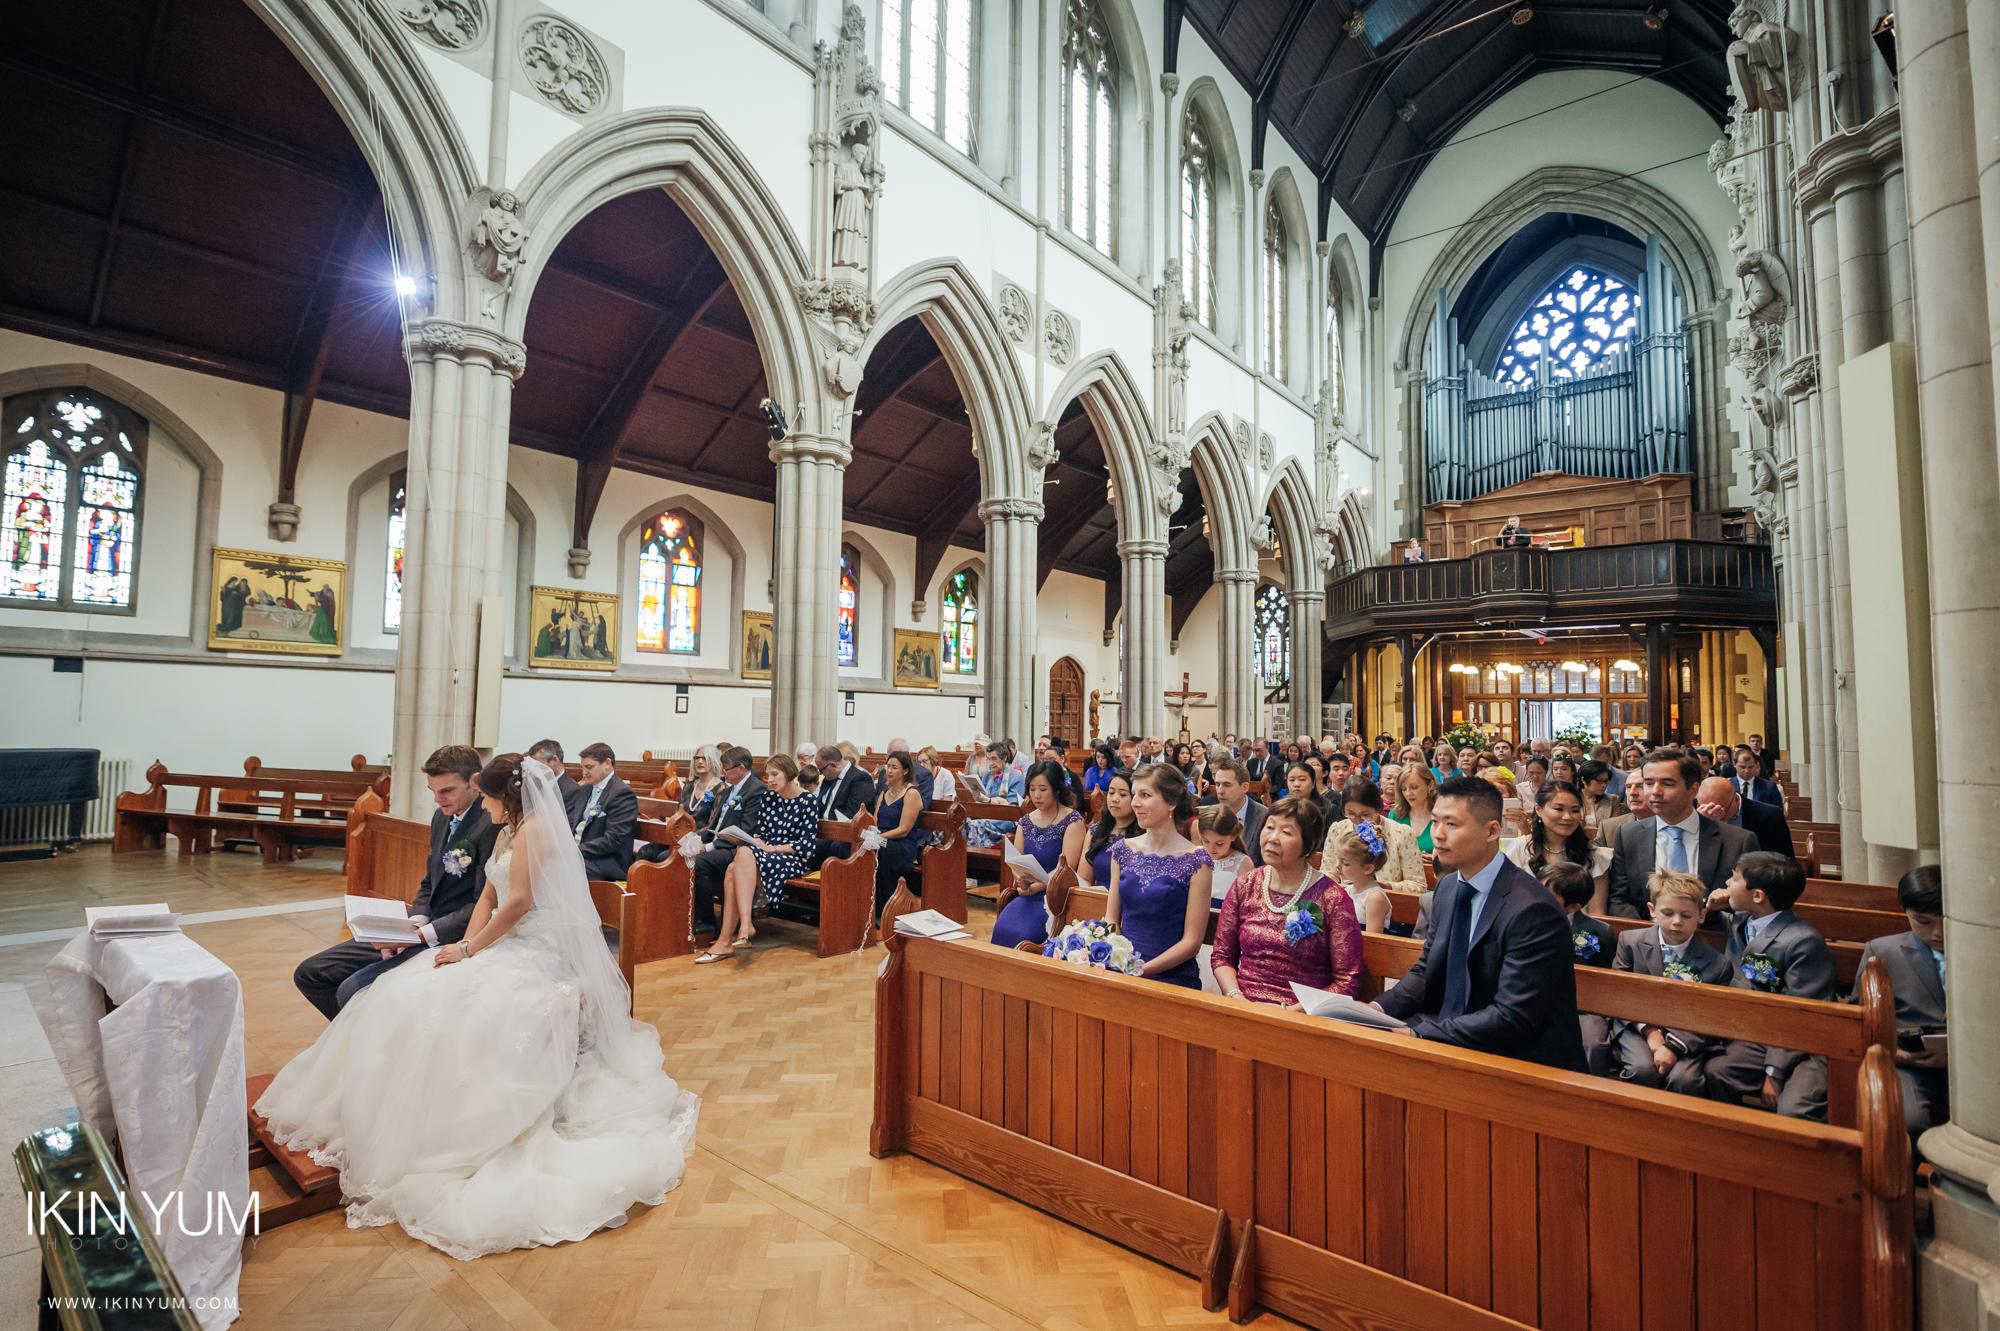 Teresa & Johnathan Weddong Day - The Ceremony-0166.jpg